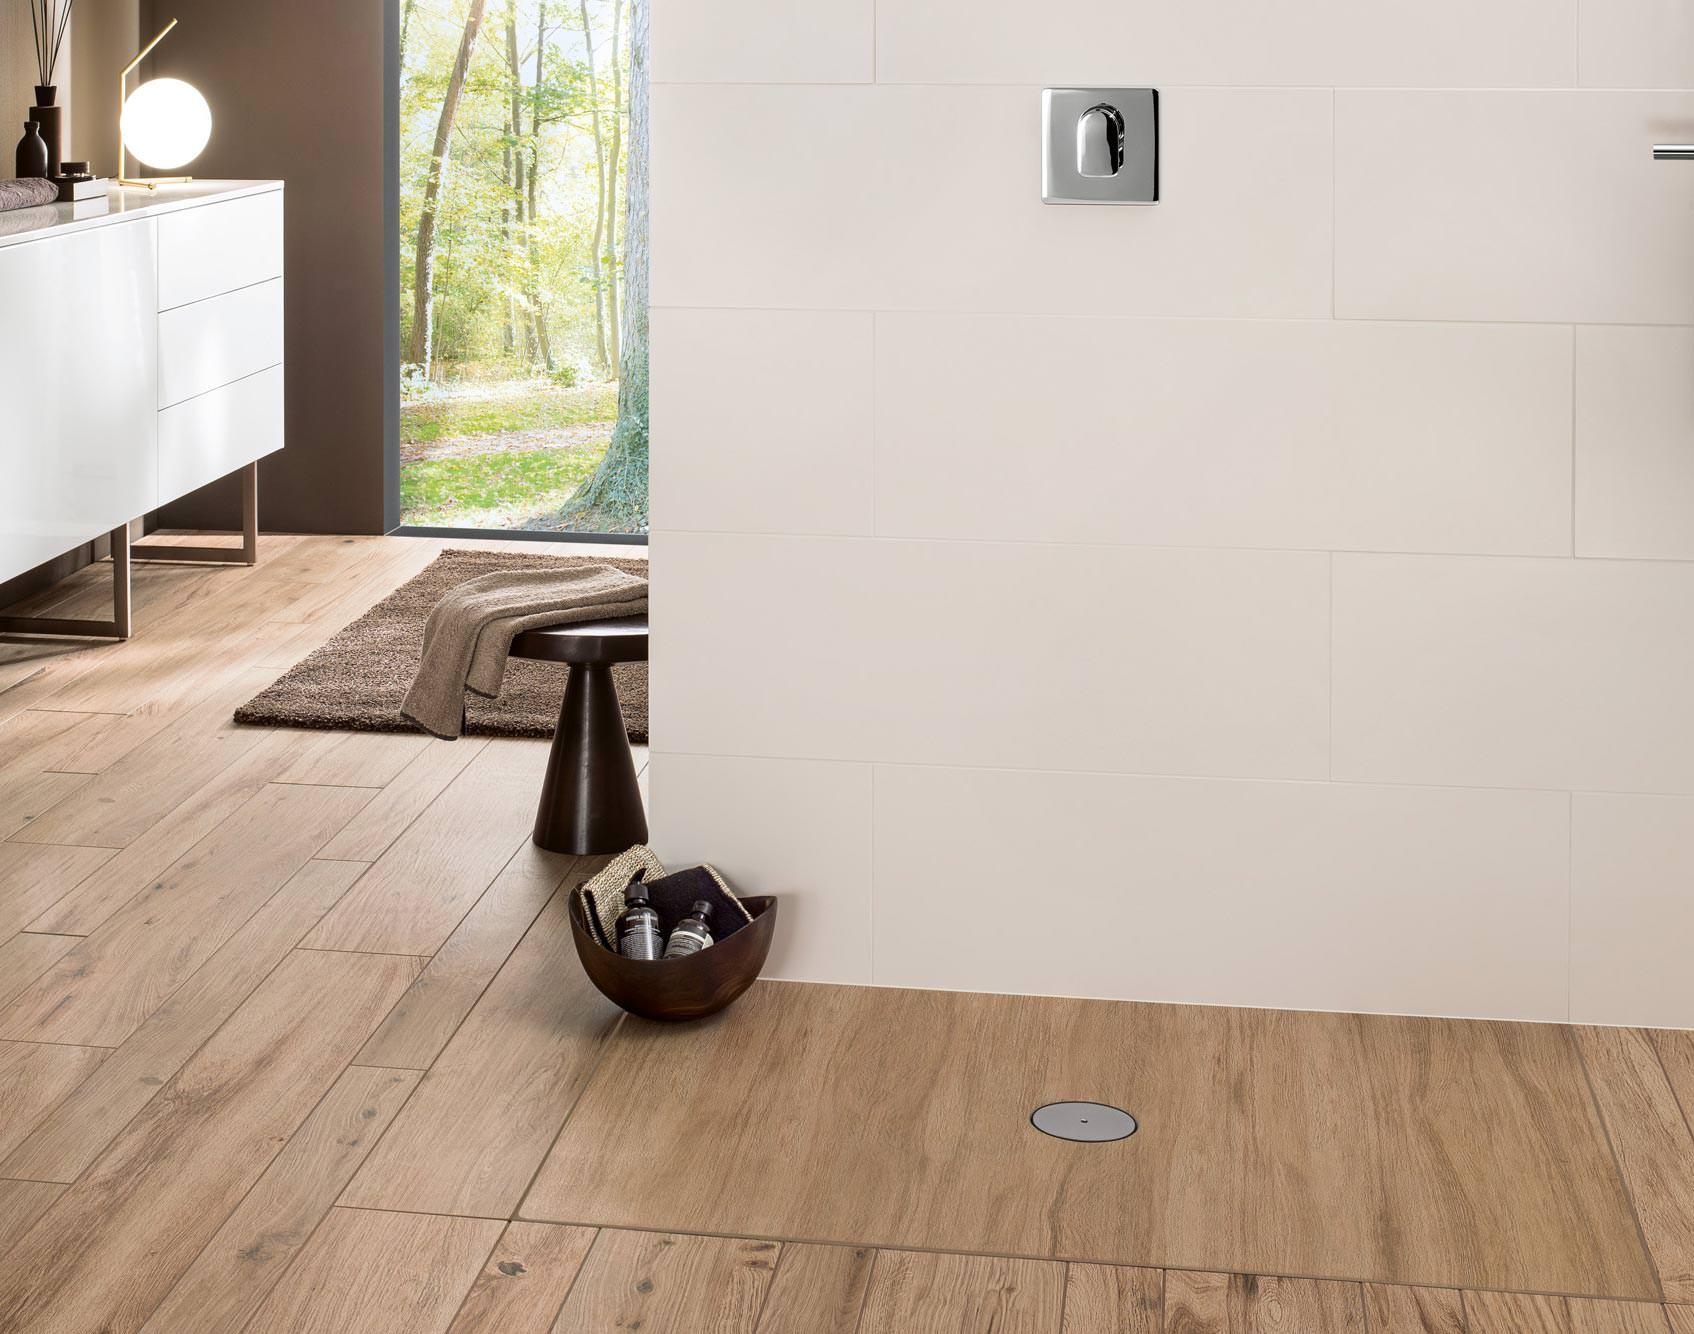 beautiful badezimmer fliesen villeroy und boch images. Black Bedroom Furniture Sets. Home Design Ideas